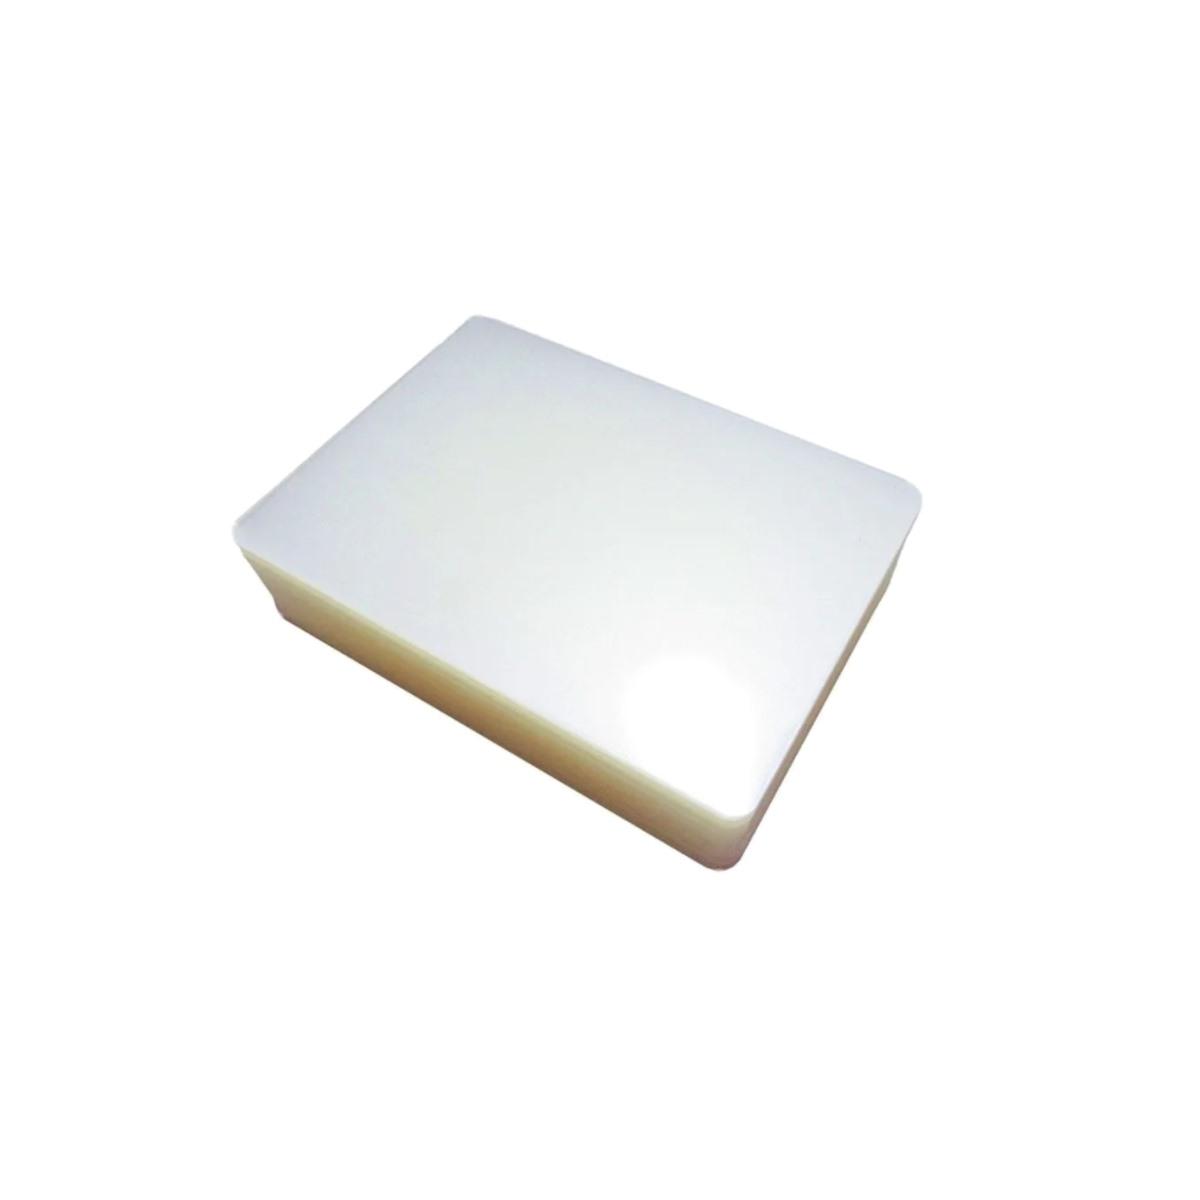 Polaseal plástico para plastificação CIC 60X90 0,07mm 100un